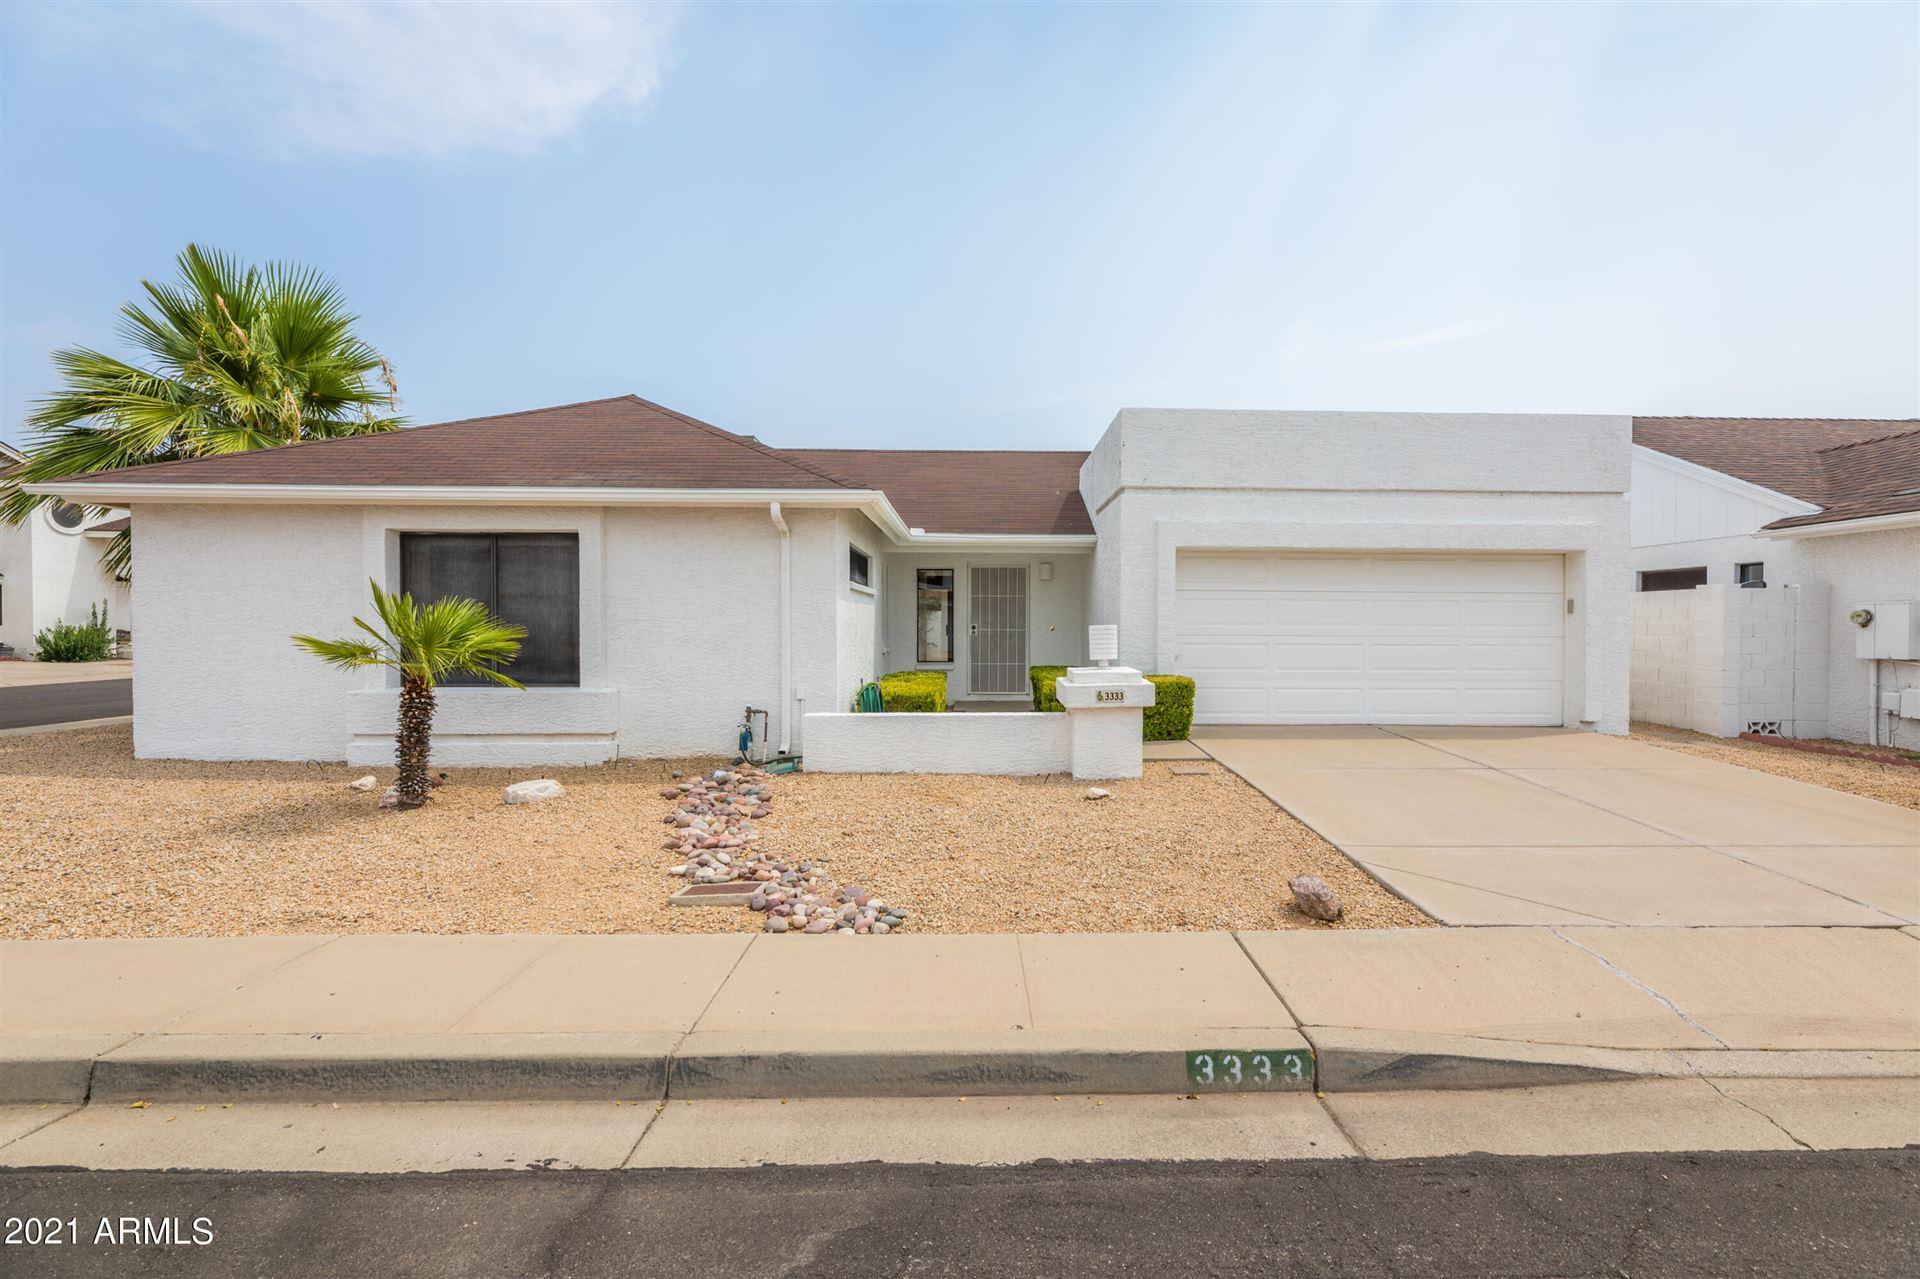 3333 E TOPEKA Drive, Phoenix, AZ 85050 - MLS#: 6269260